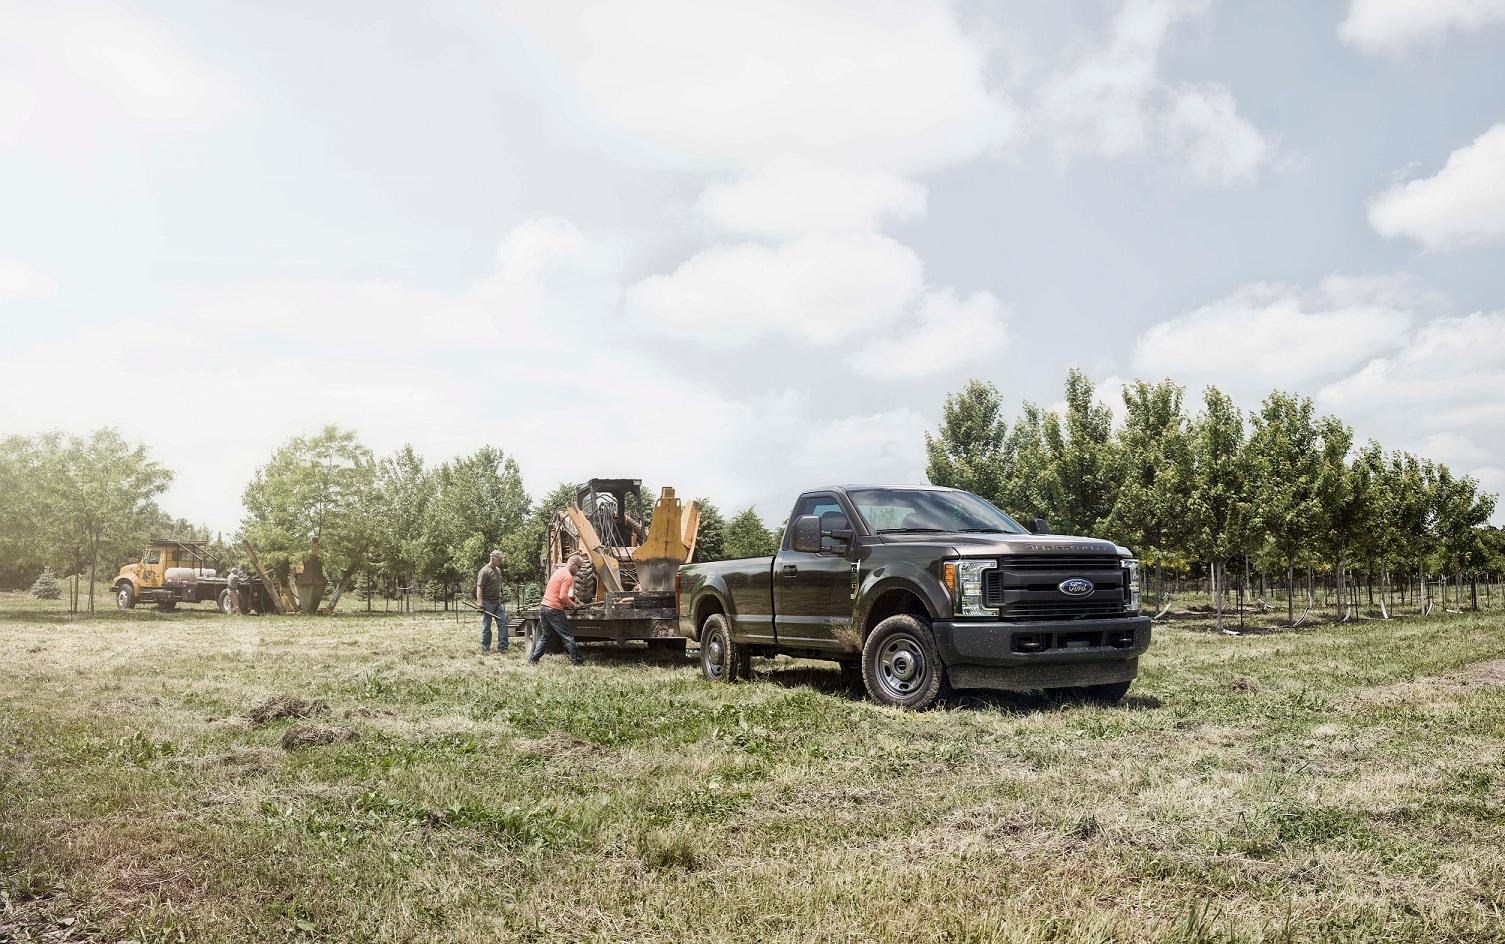 used ford trucks for sale in casper wy greiner ford. Black Bedroom Furniture Sets. Home Design Ideas